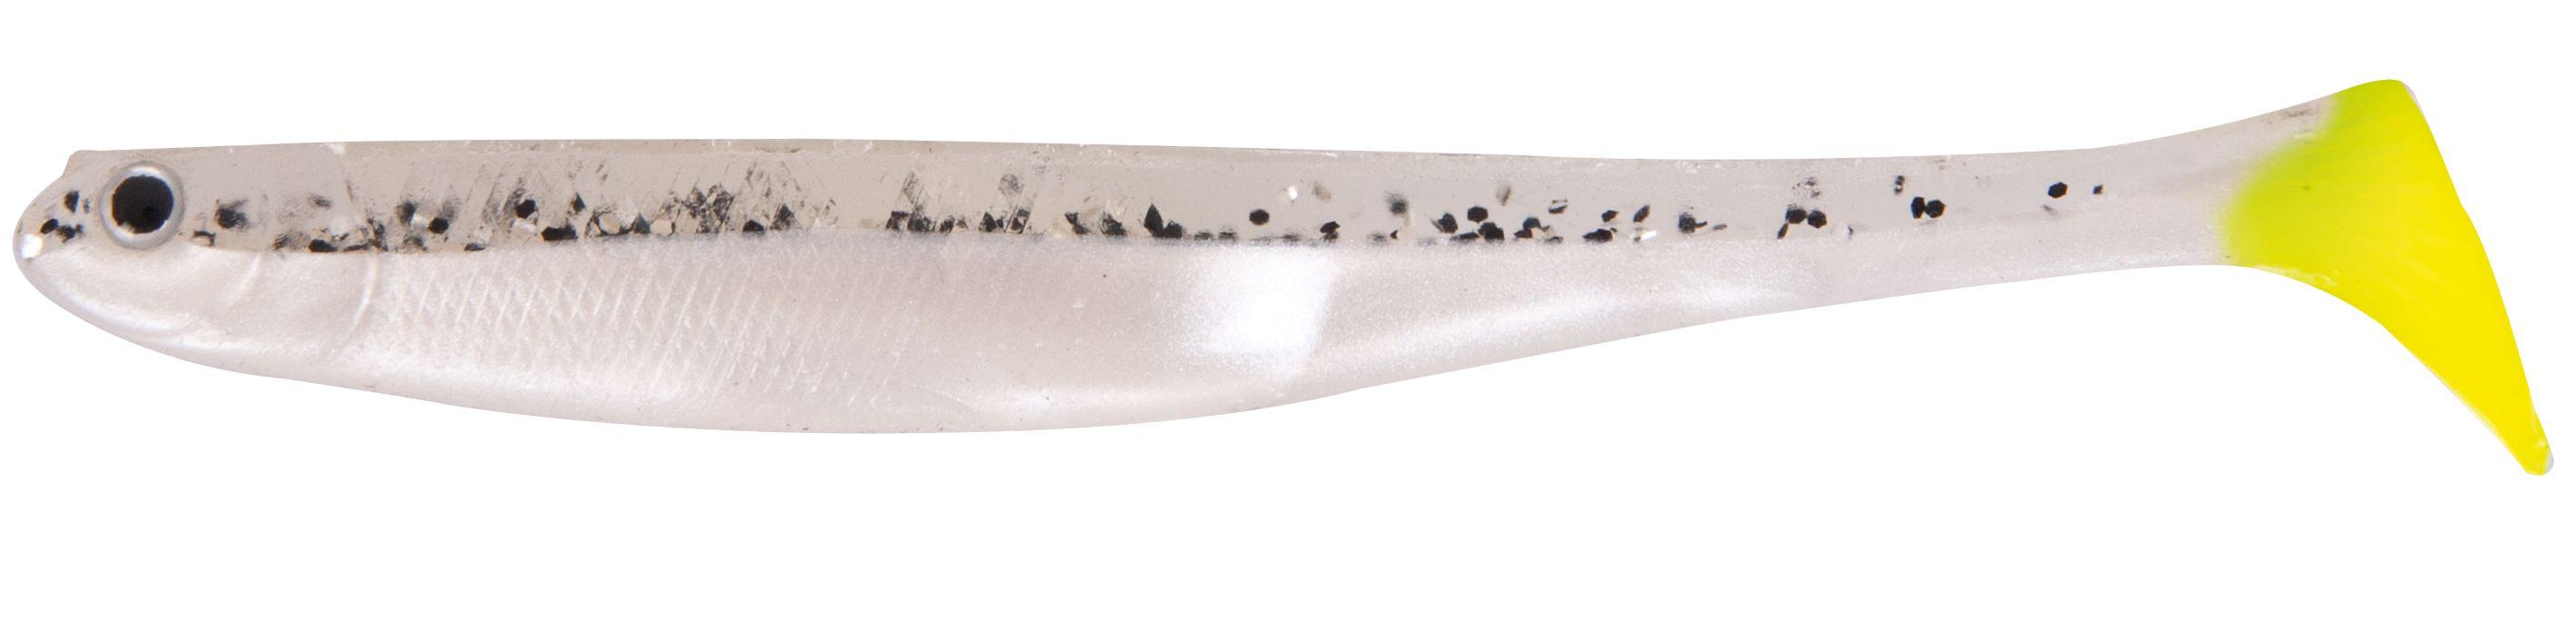 Iron Claw gumová nástraha Slim Jim 7 cm Vzor CT, 3 ks